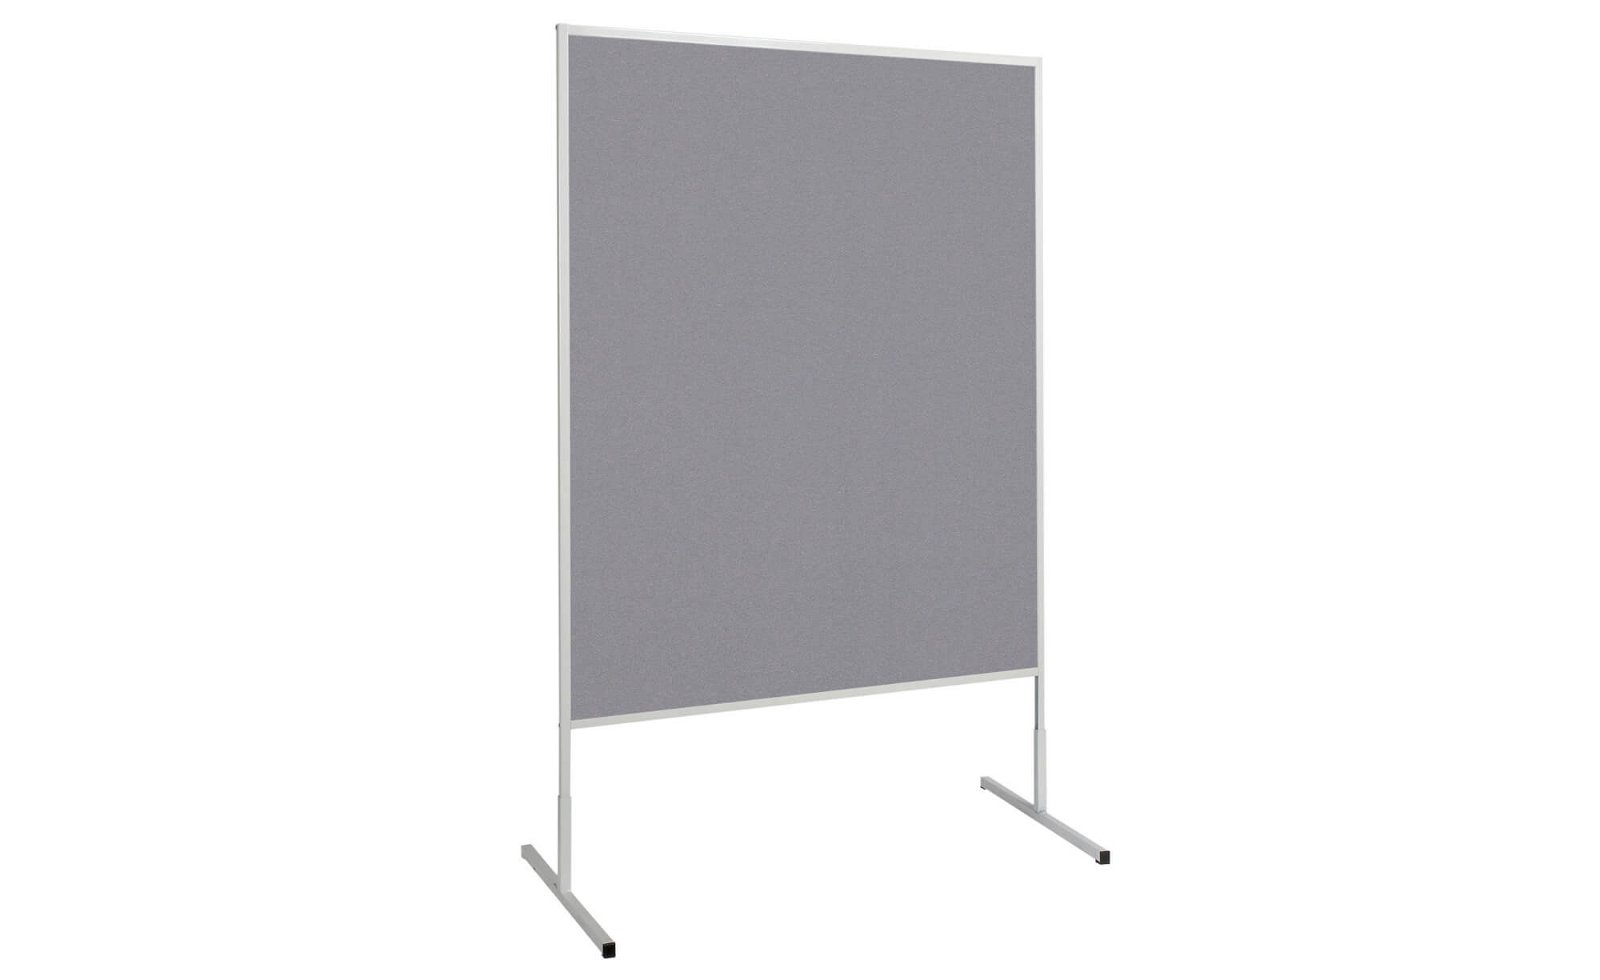 Moderationstafel MAULstandard Filz grau, 150x120 cm, grau